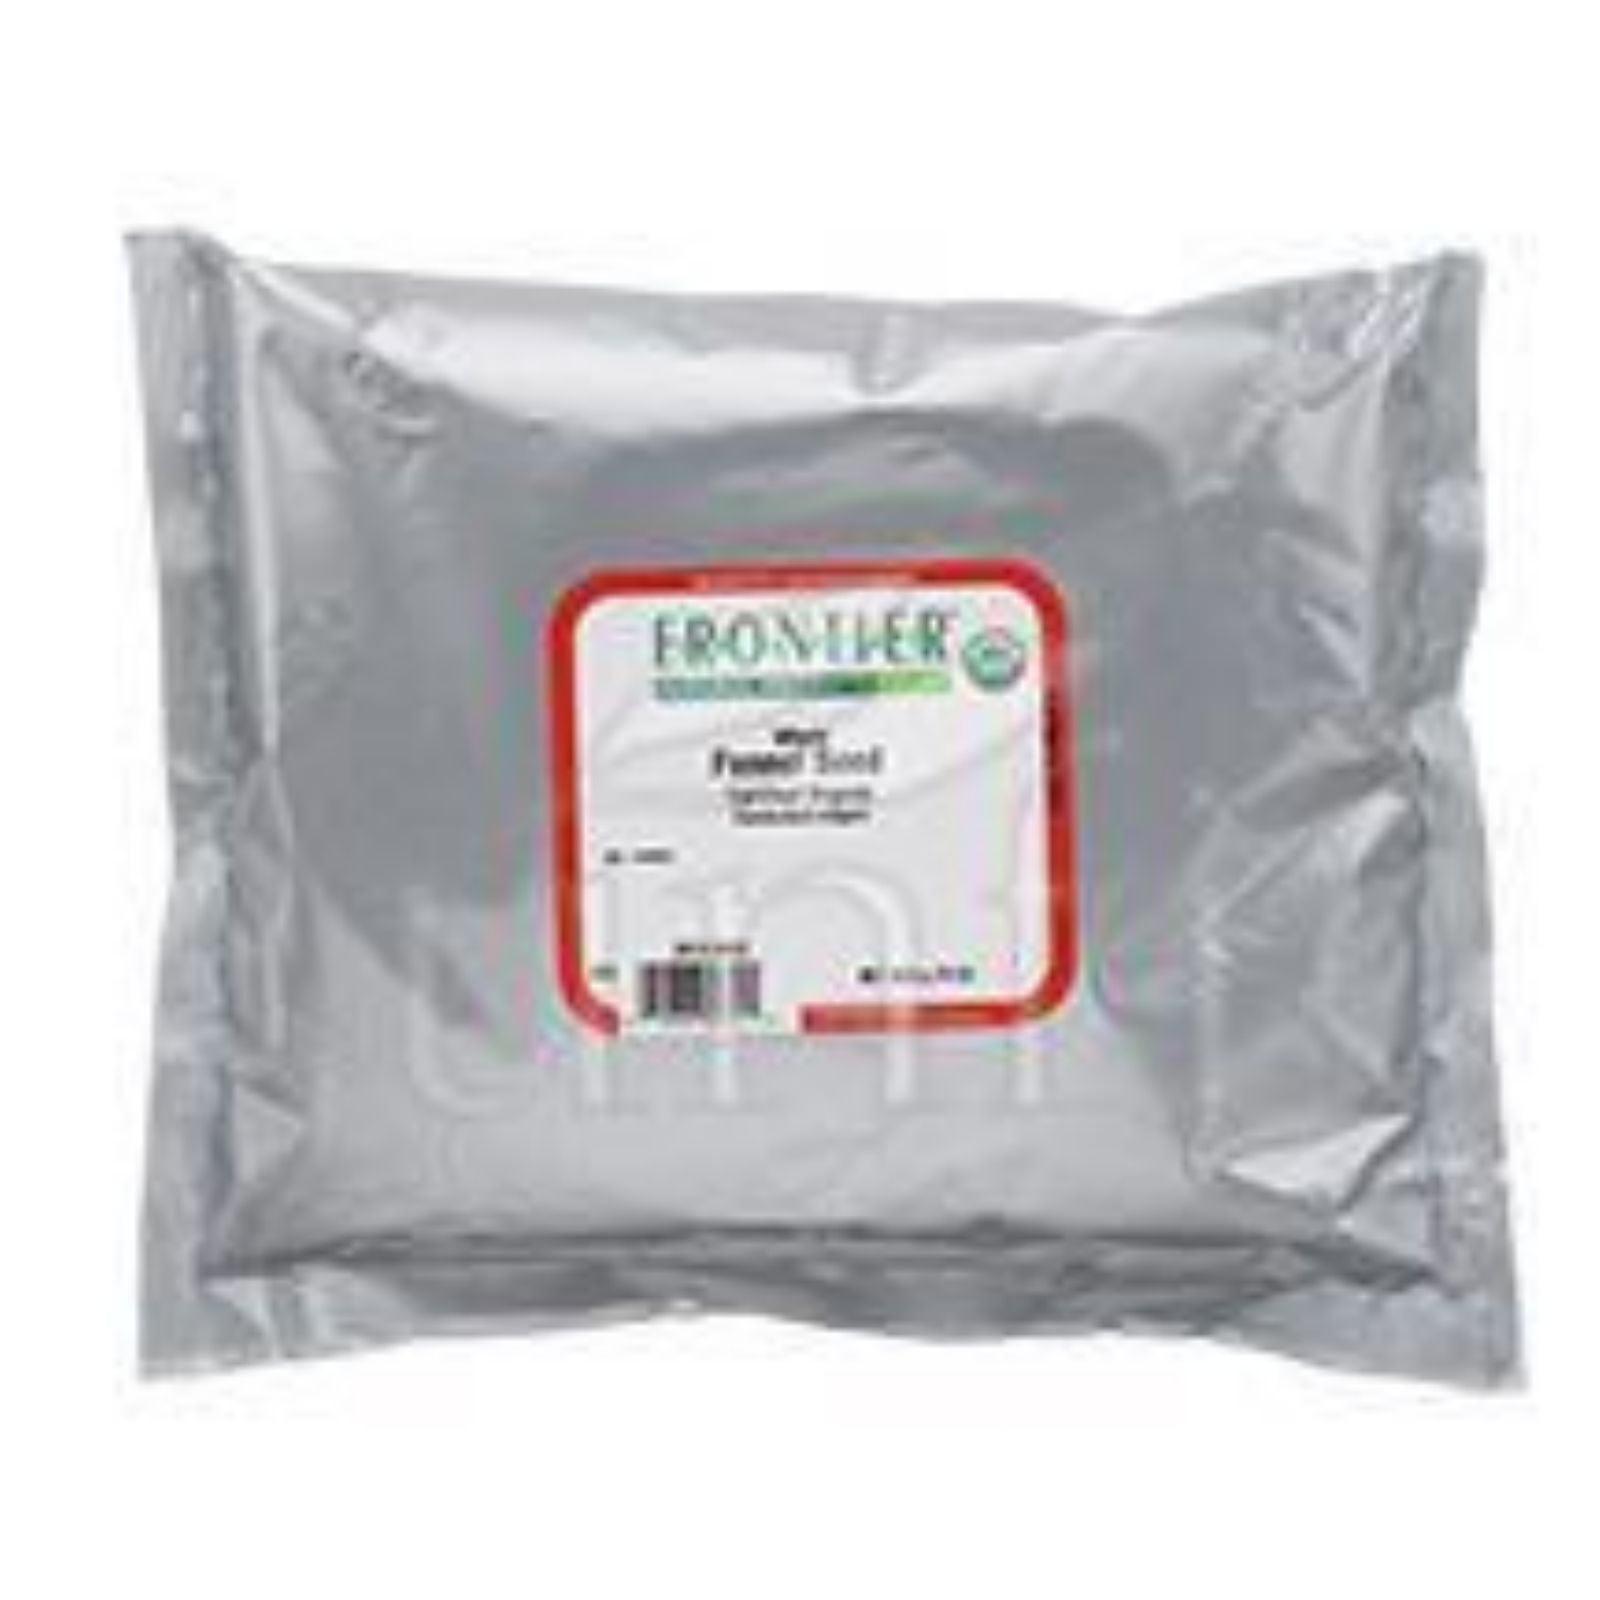 Frontier Herb Fennel Seed - Organic - Whole - Bulk - 1 lb...